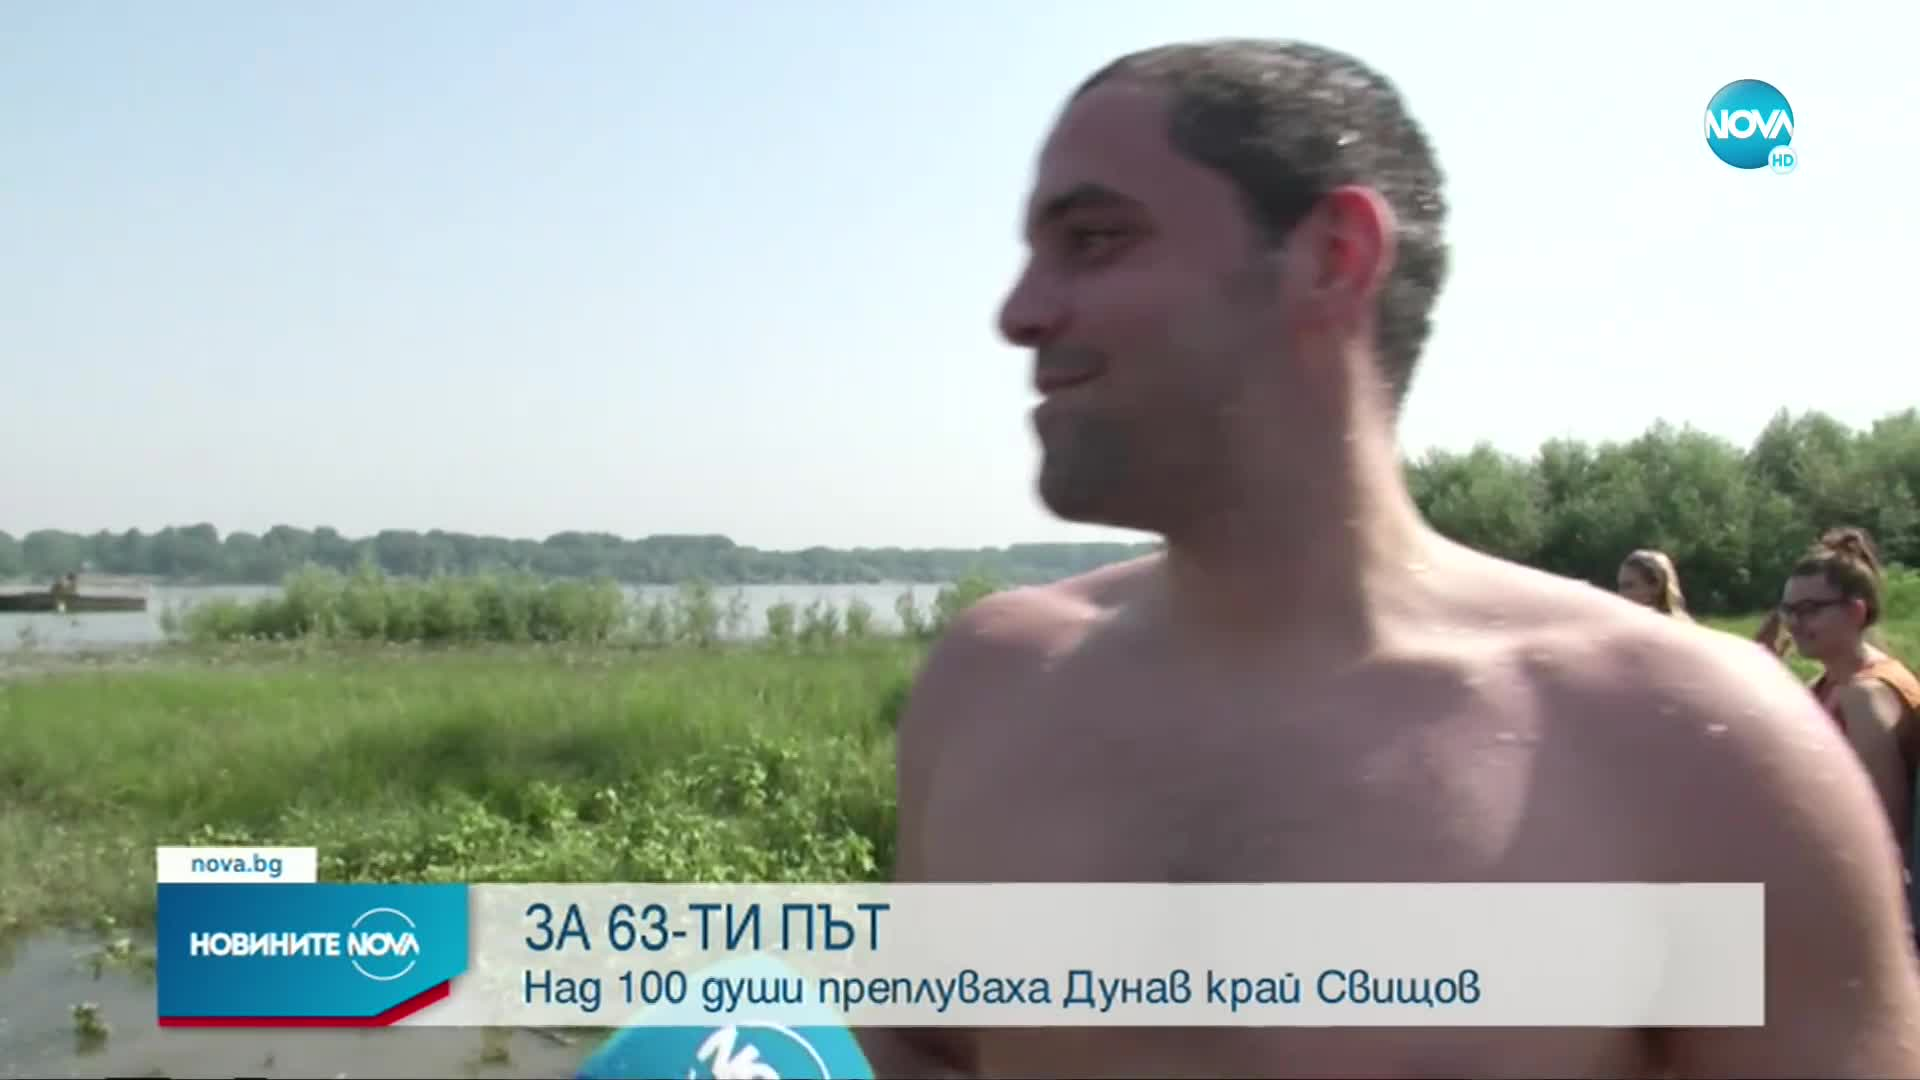 Над сто души преплуваха река Дунав край Свищов